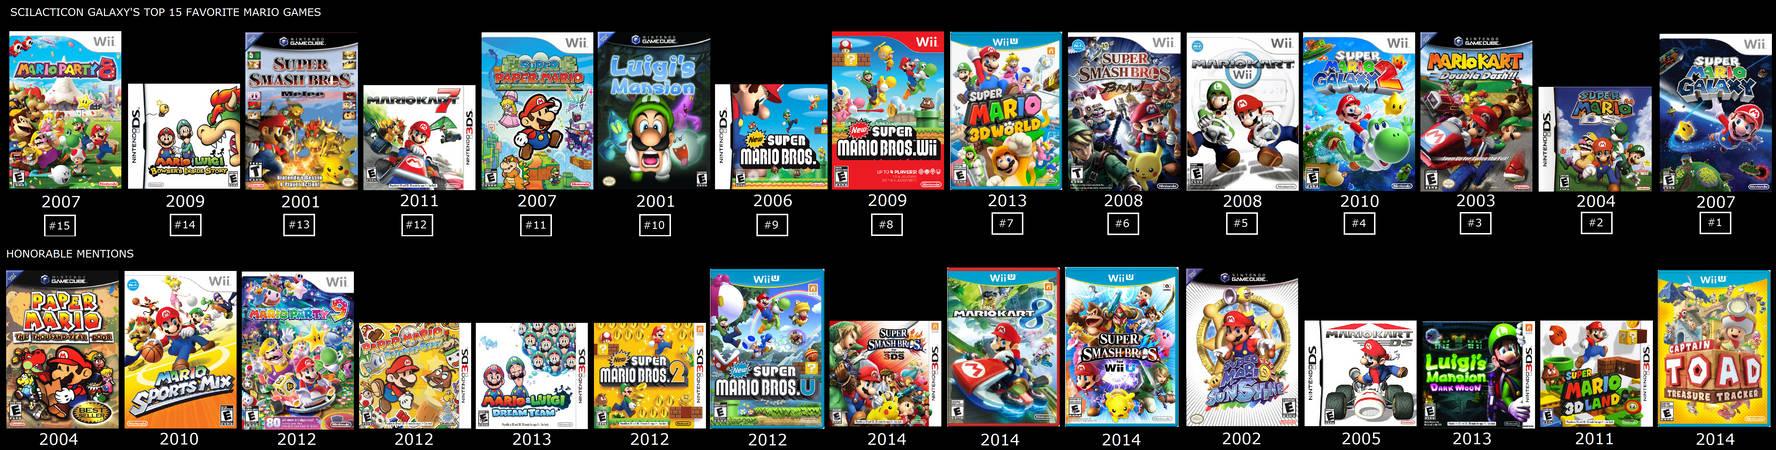 My Top 15 Personal Favorite Mario Games by ScilacticonGalaxy